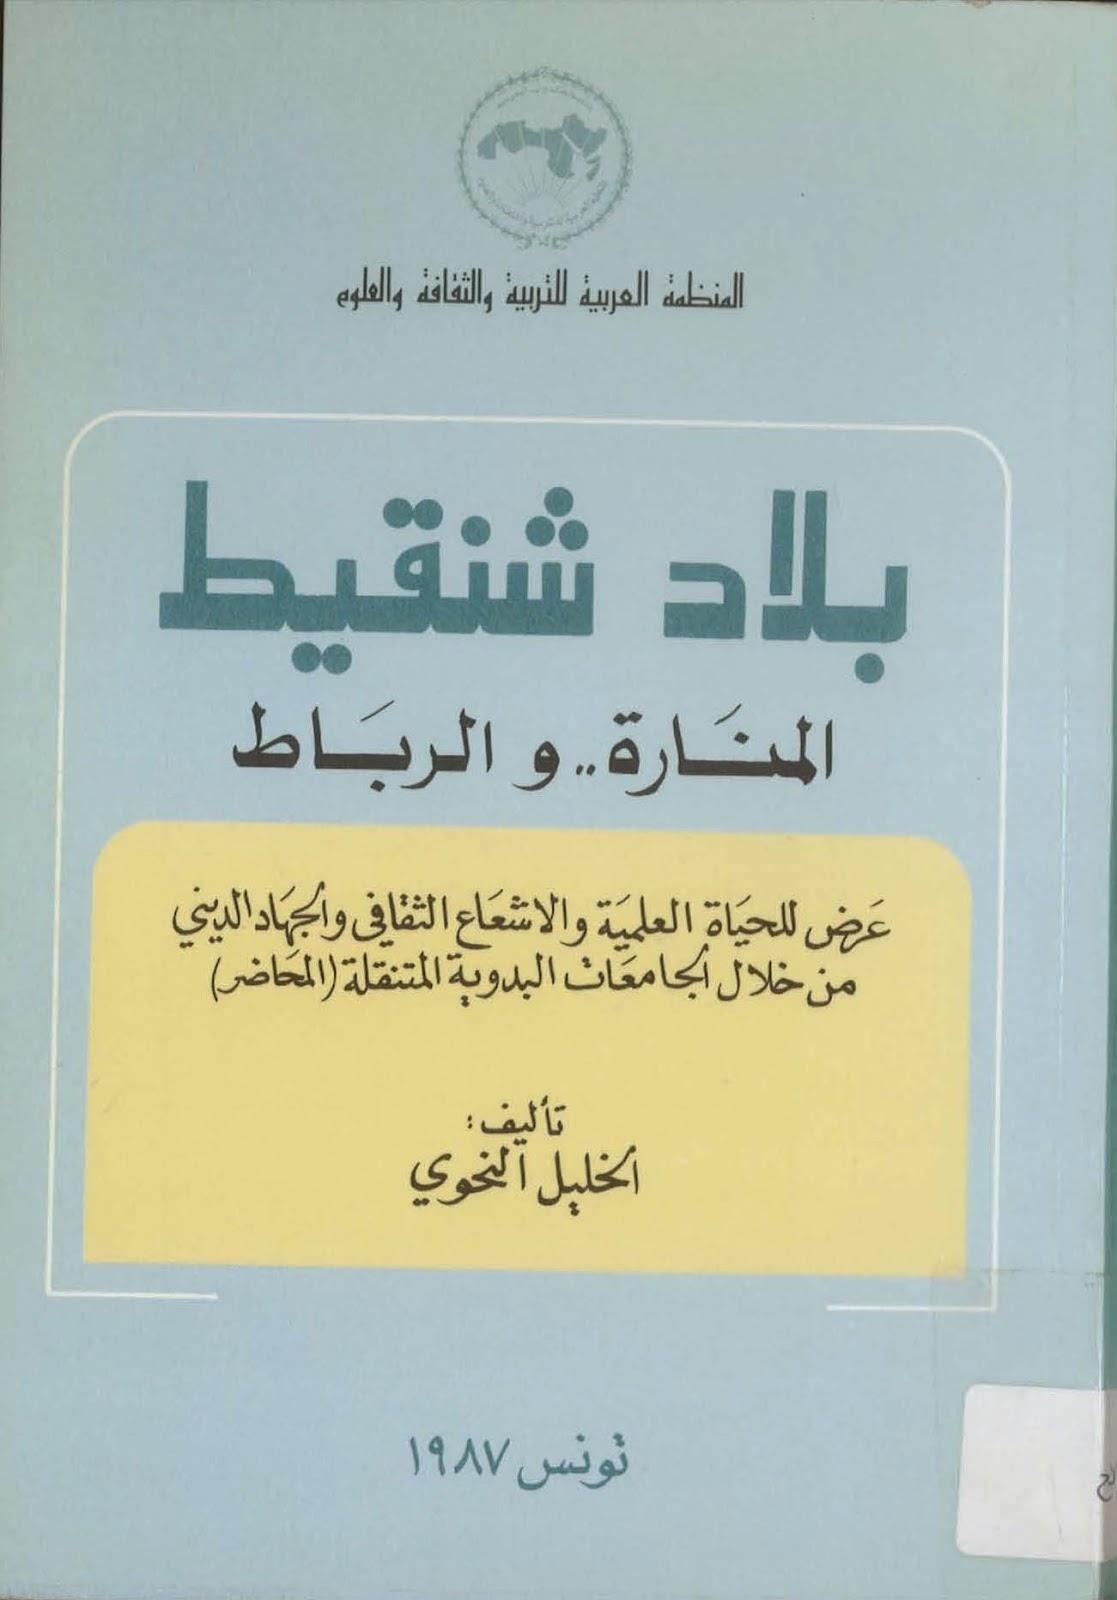 "Photo of كتاب ""بلاد شنقيط، المنارة.. والرباط"" للشيخ الخليل النحوي"